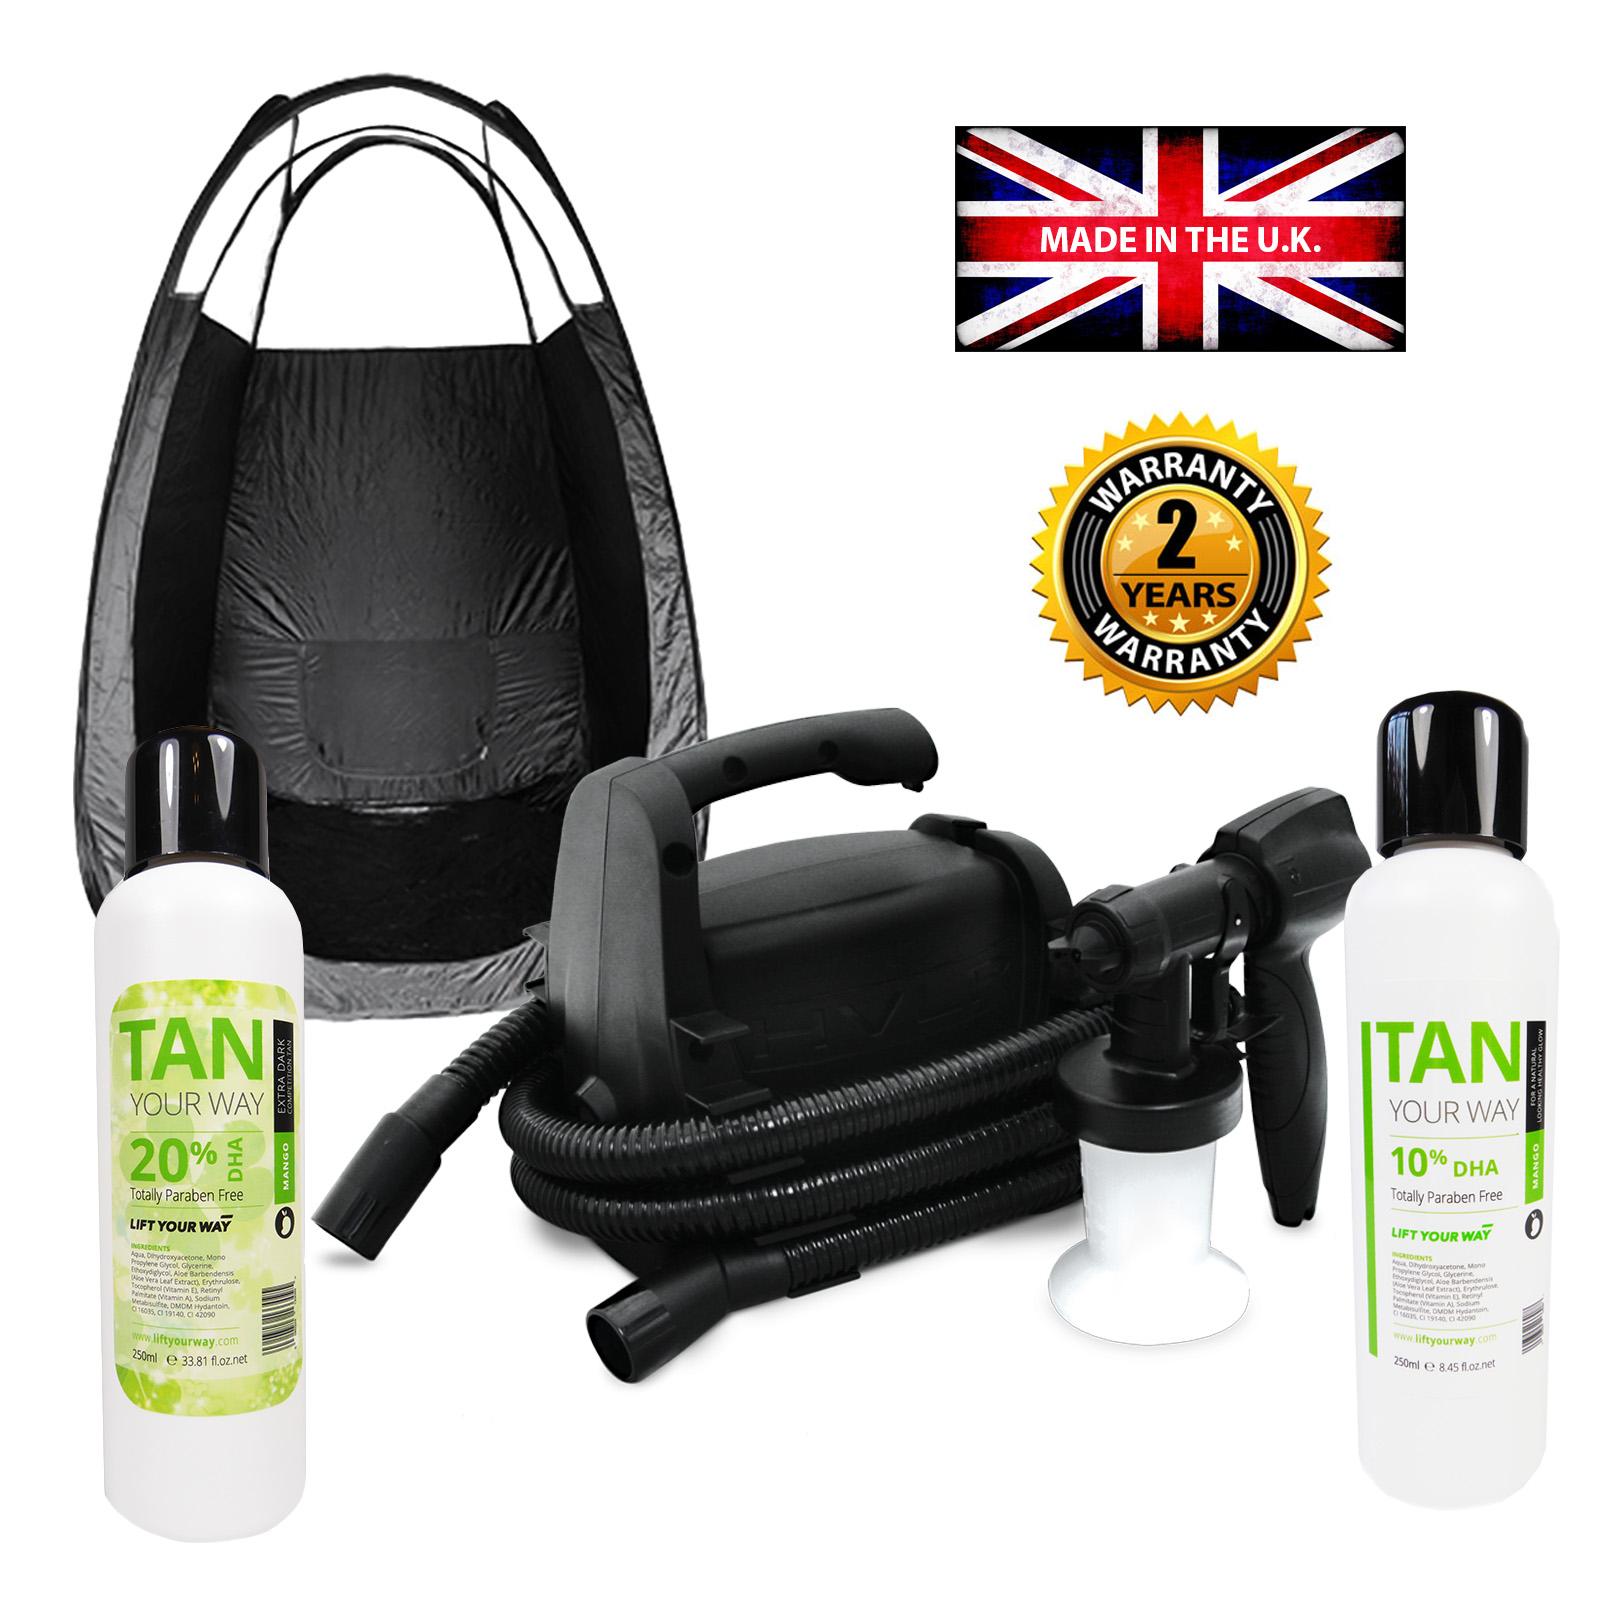 TS50 tanning kit